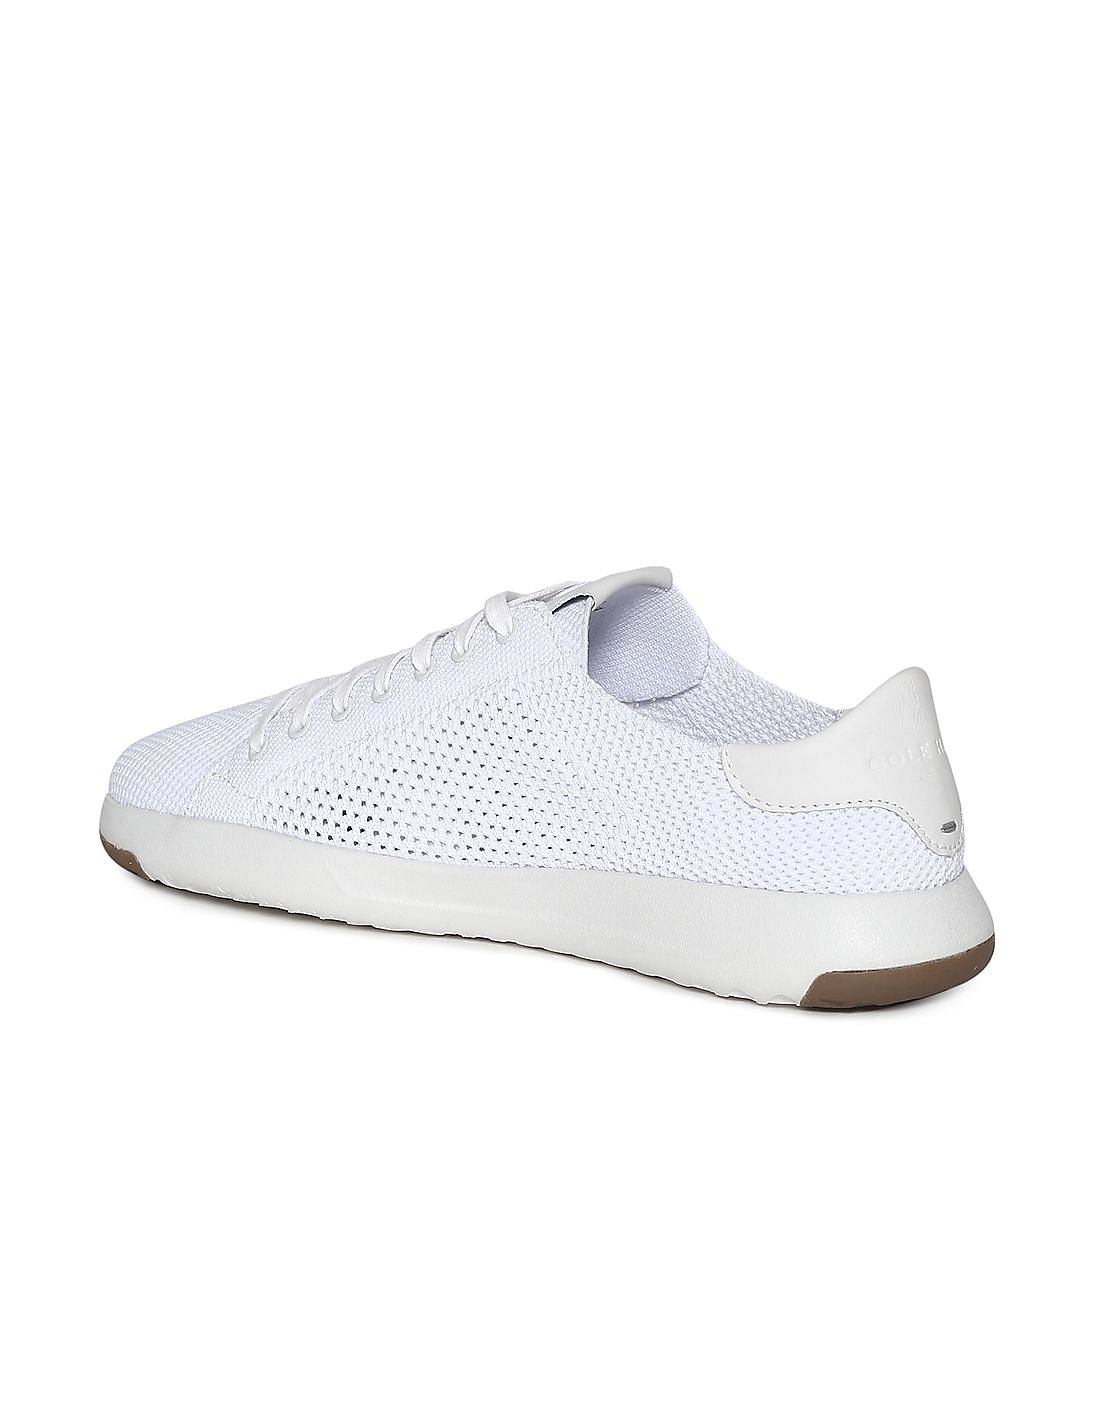 Men Grandpre Tennis Stitchlite Sneakers